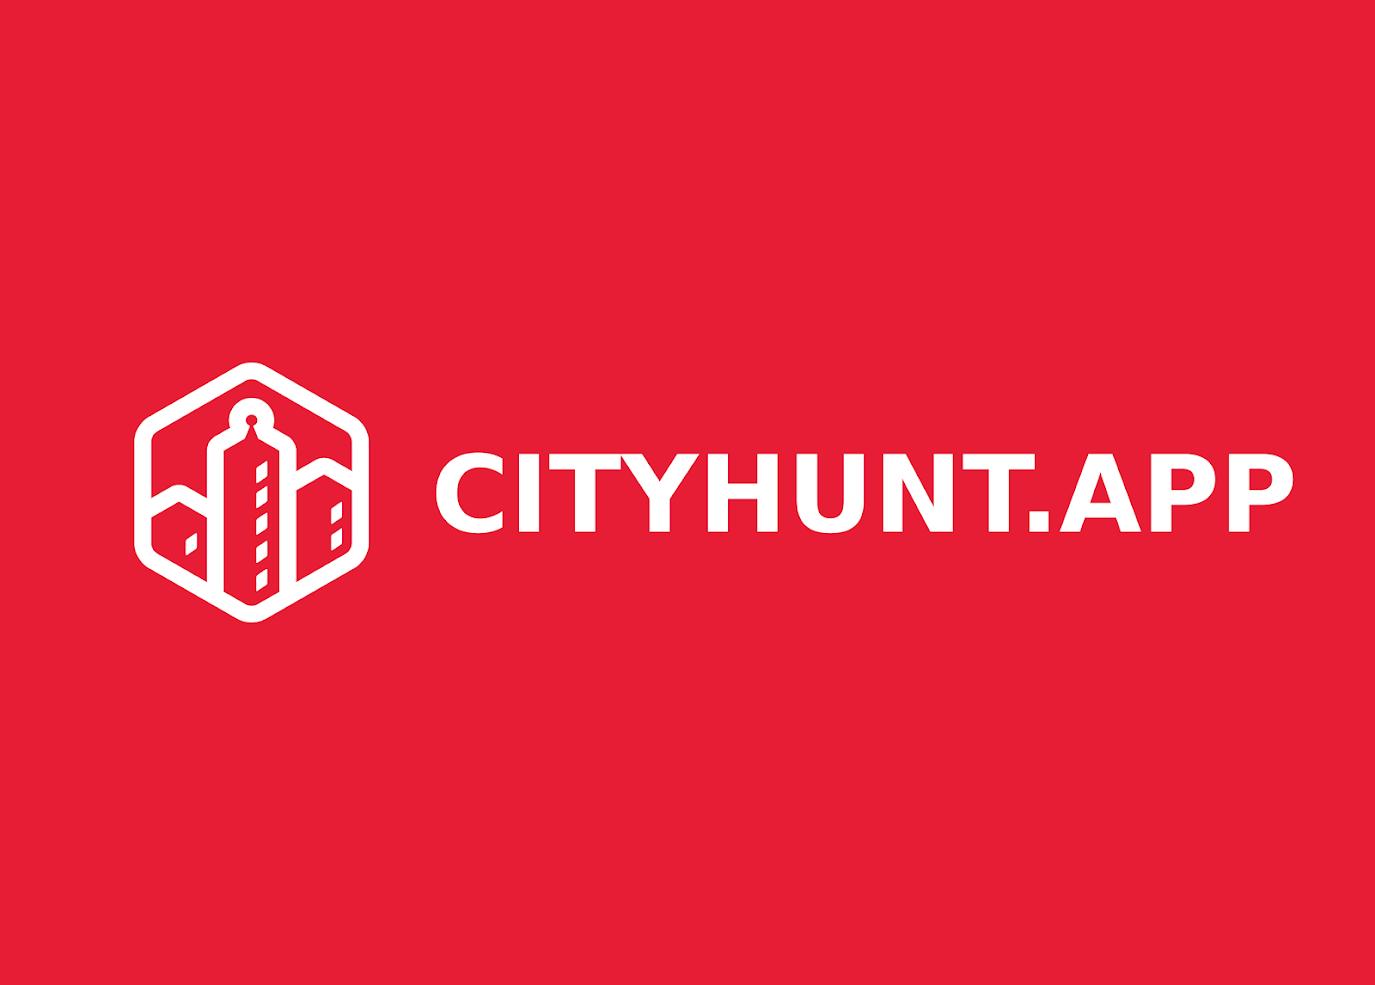 CityHunt